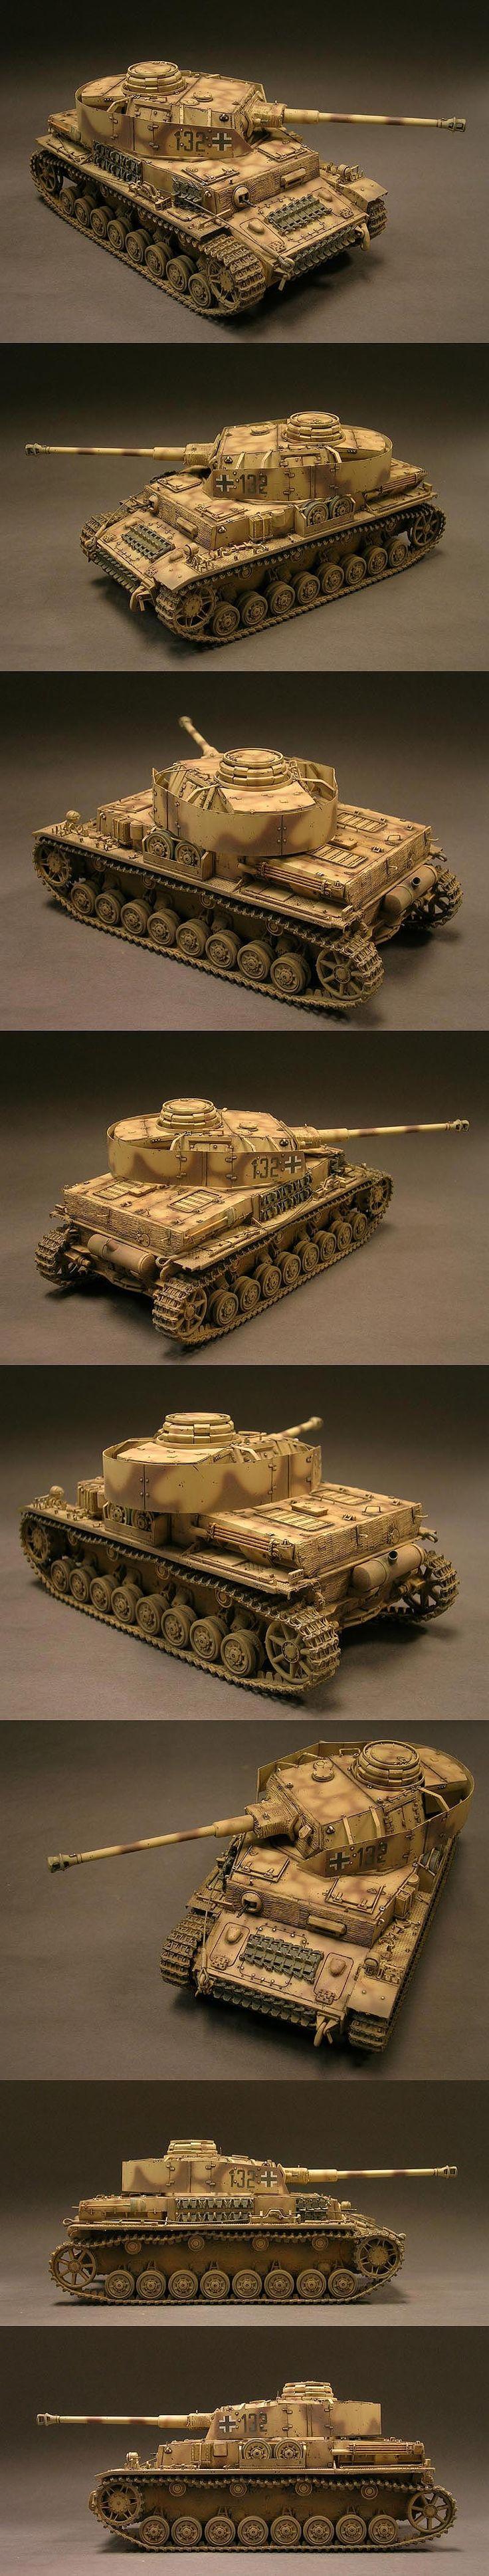 Panzer IV Ausf.J 1/35 Scale Model